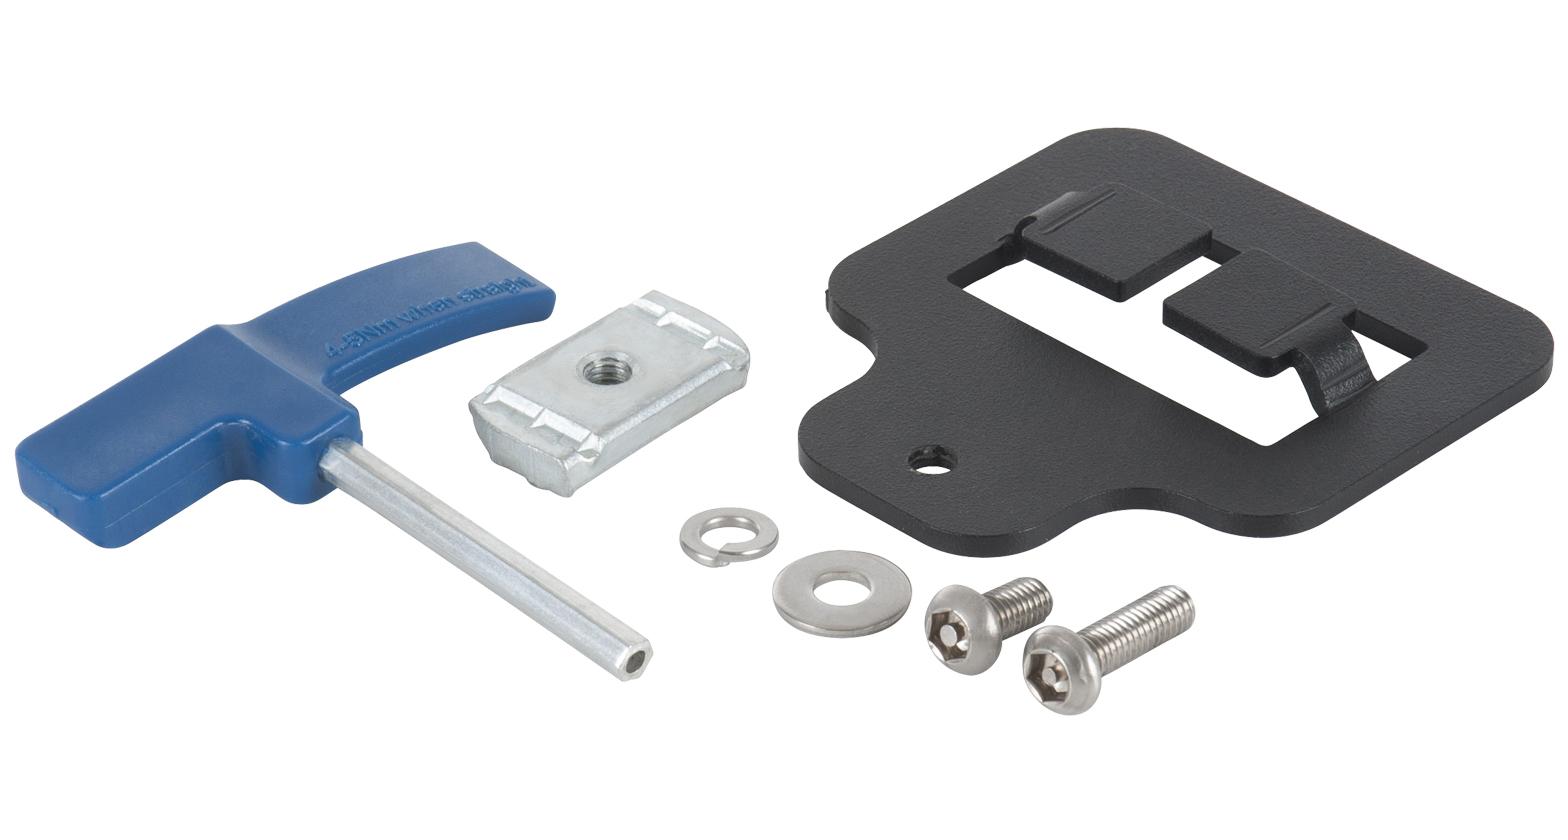 Rhino Roof Bar Fitting: Roof Top Bike Carrier Fit Kit (RBC035/RBC036